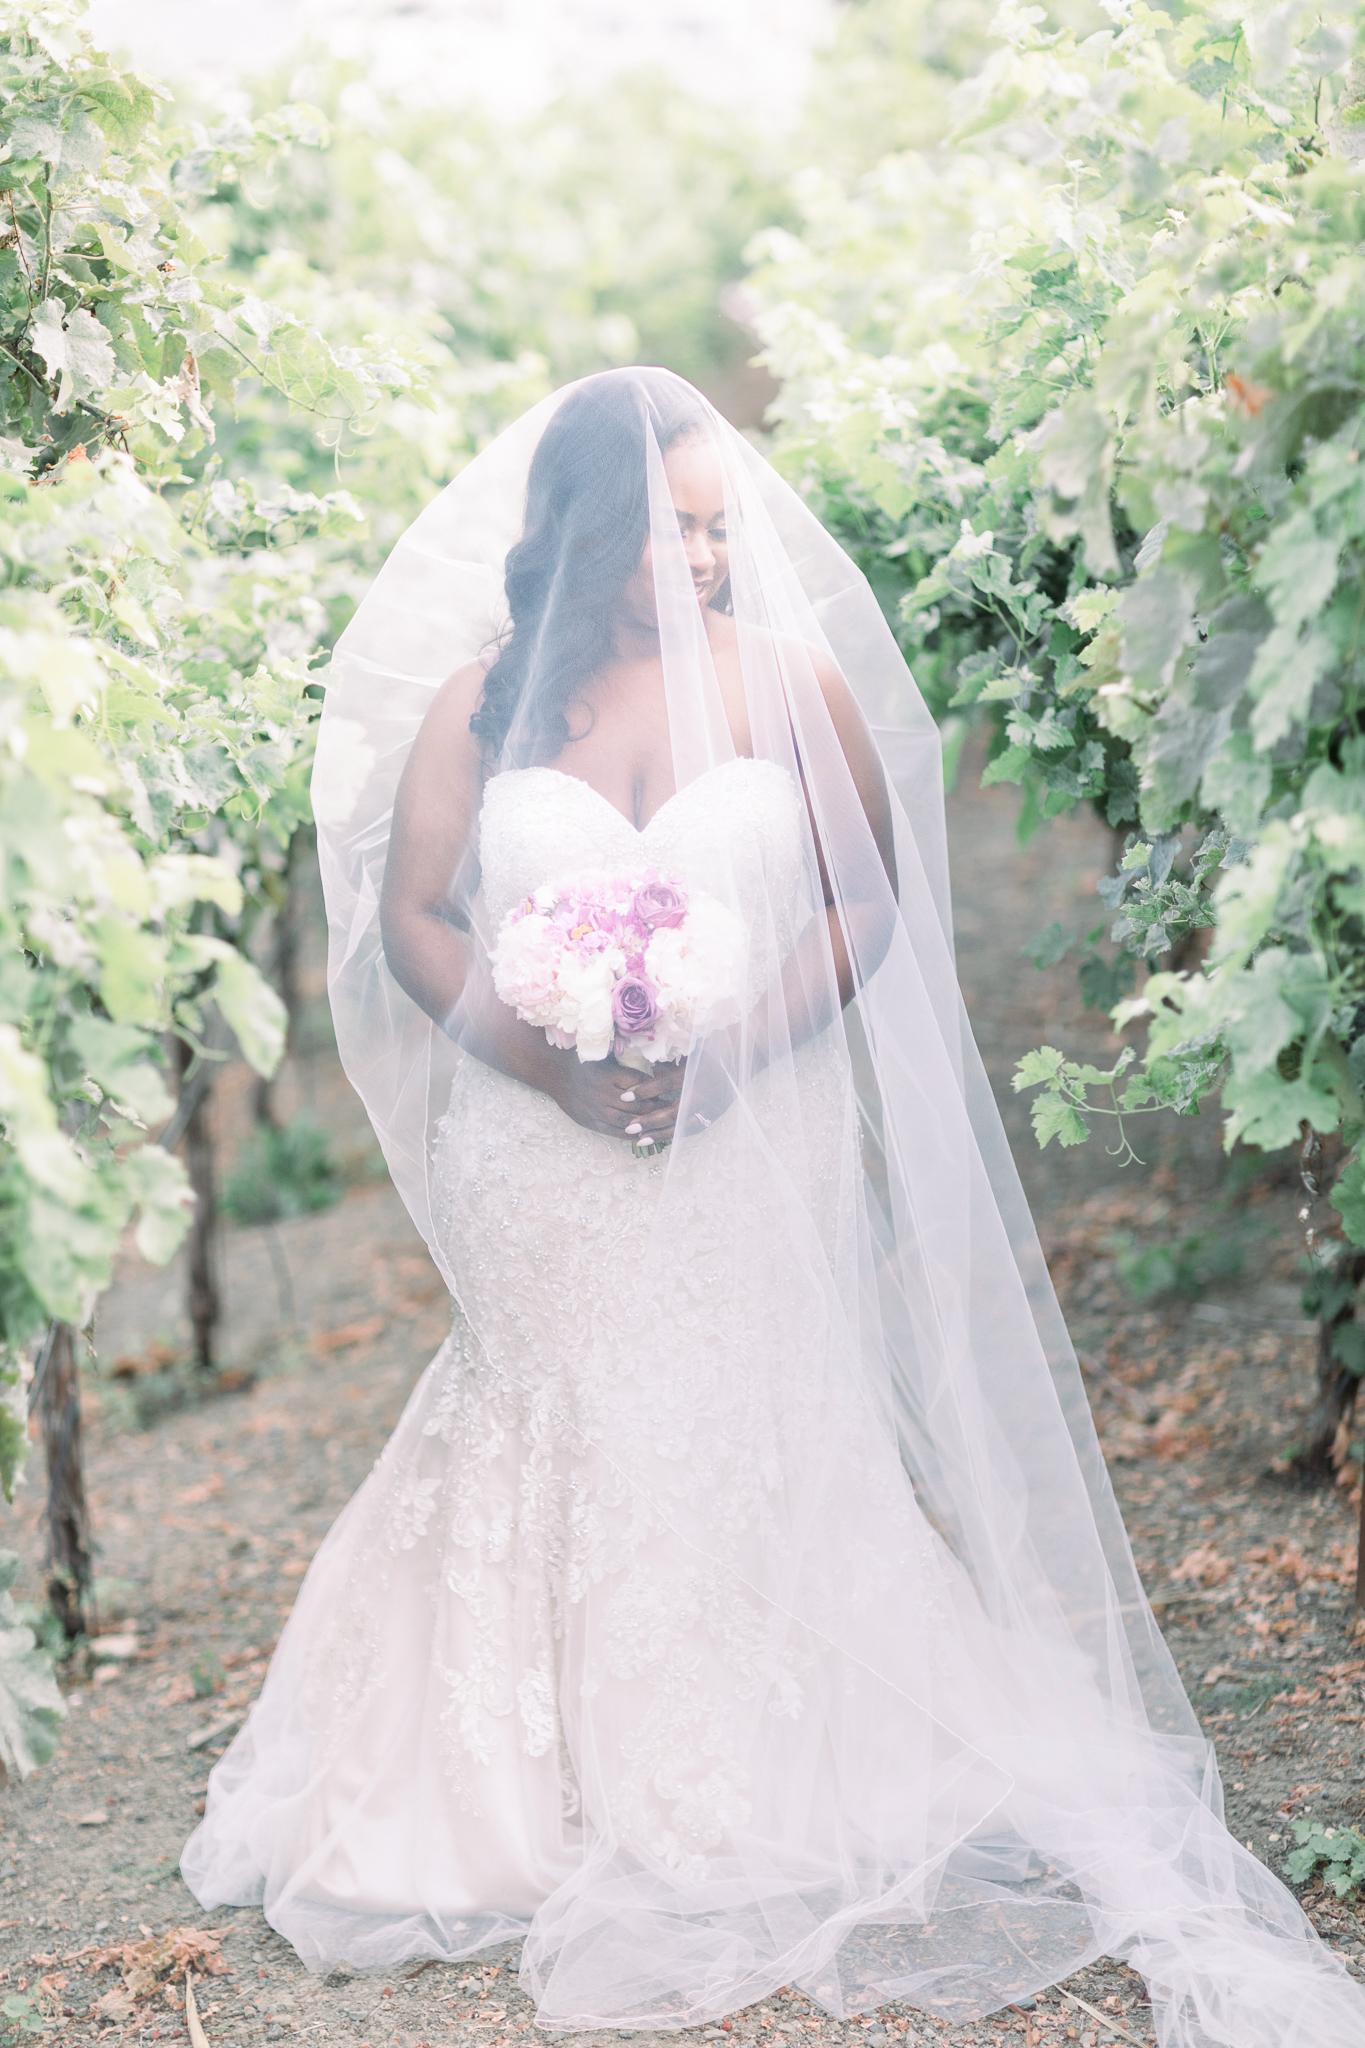 bride standing outside in strapless dress silk champagne underlay